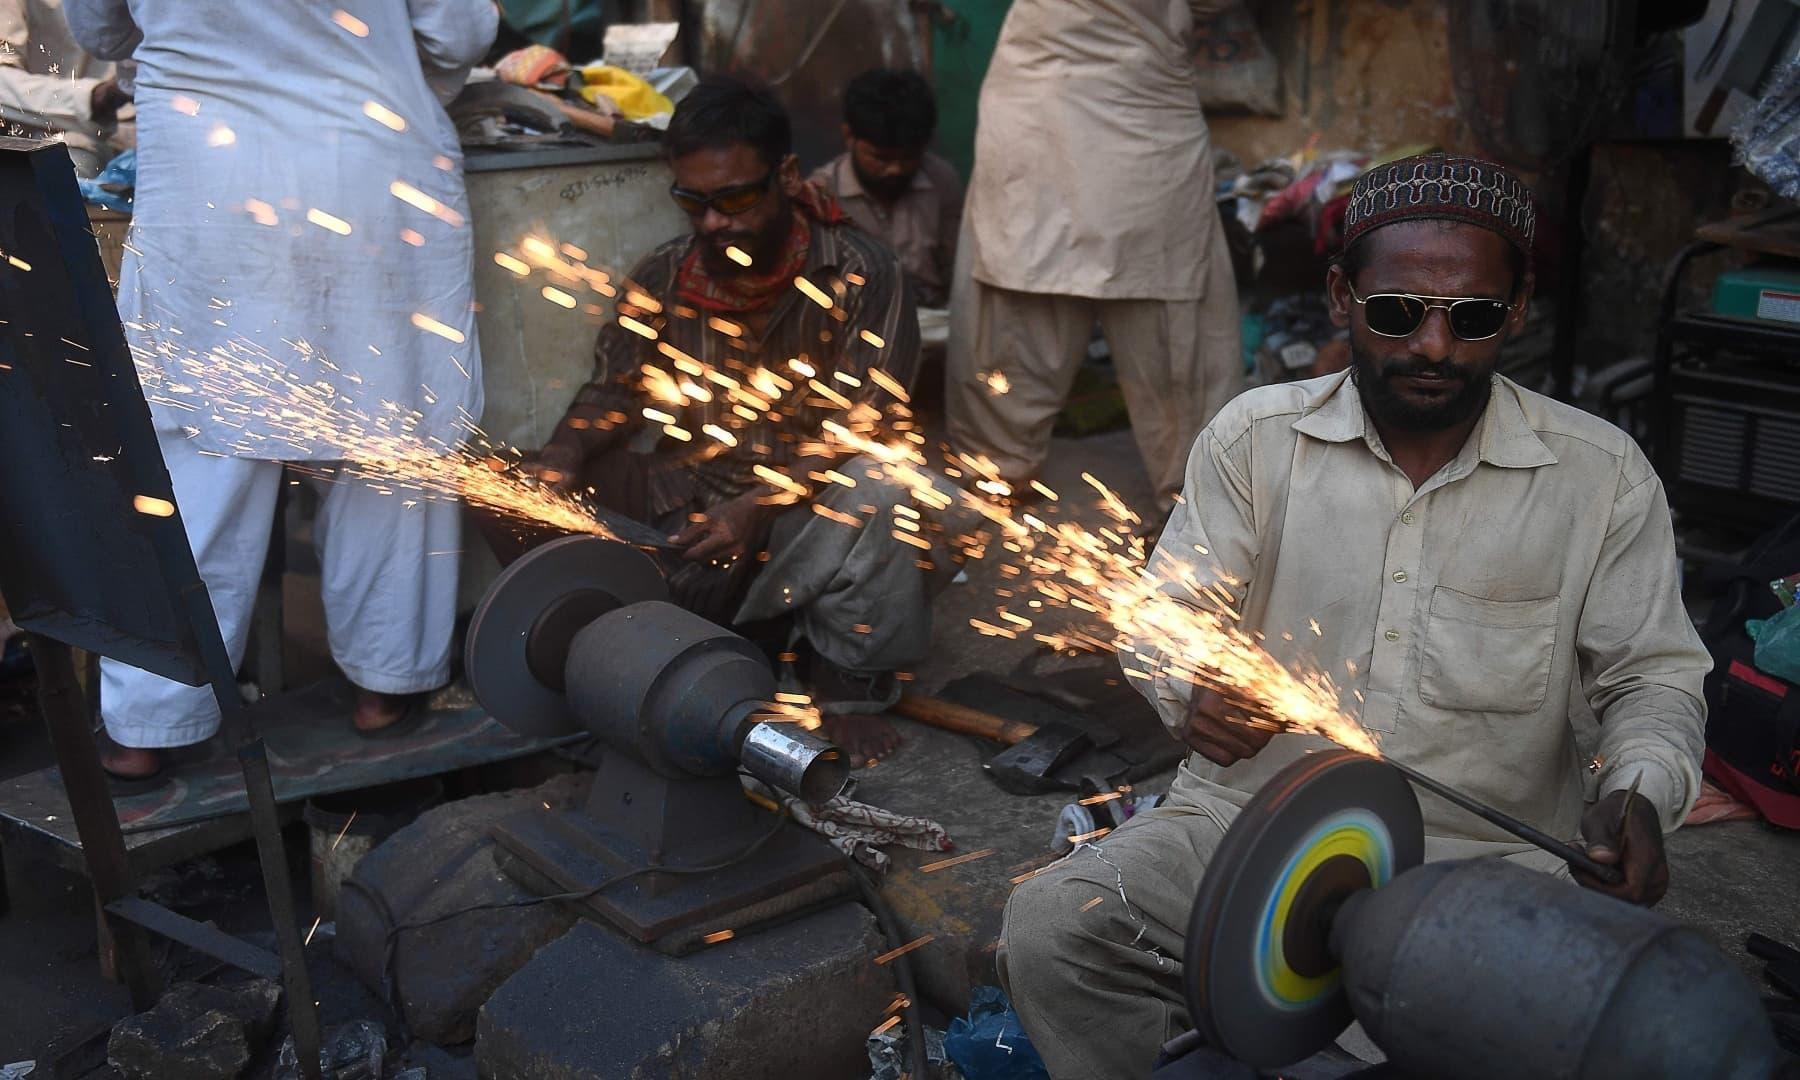 Men sharpen knives at a shop on the eve of Eidul Azha in Karachi on July 31, 2020. — AFP